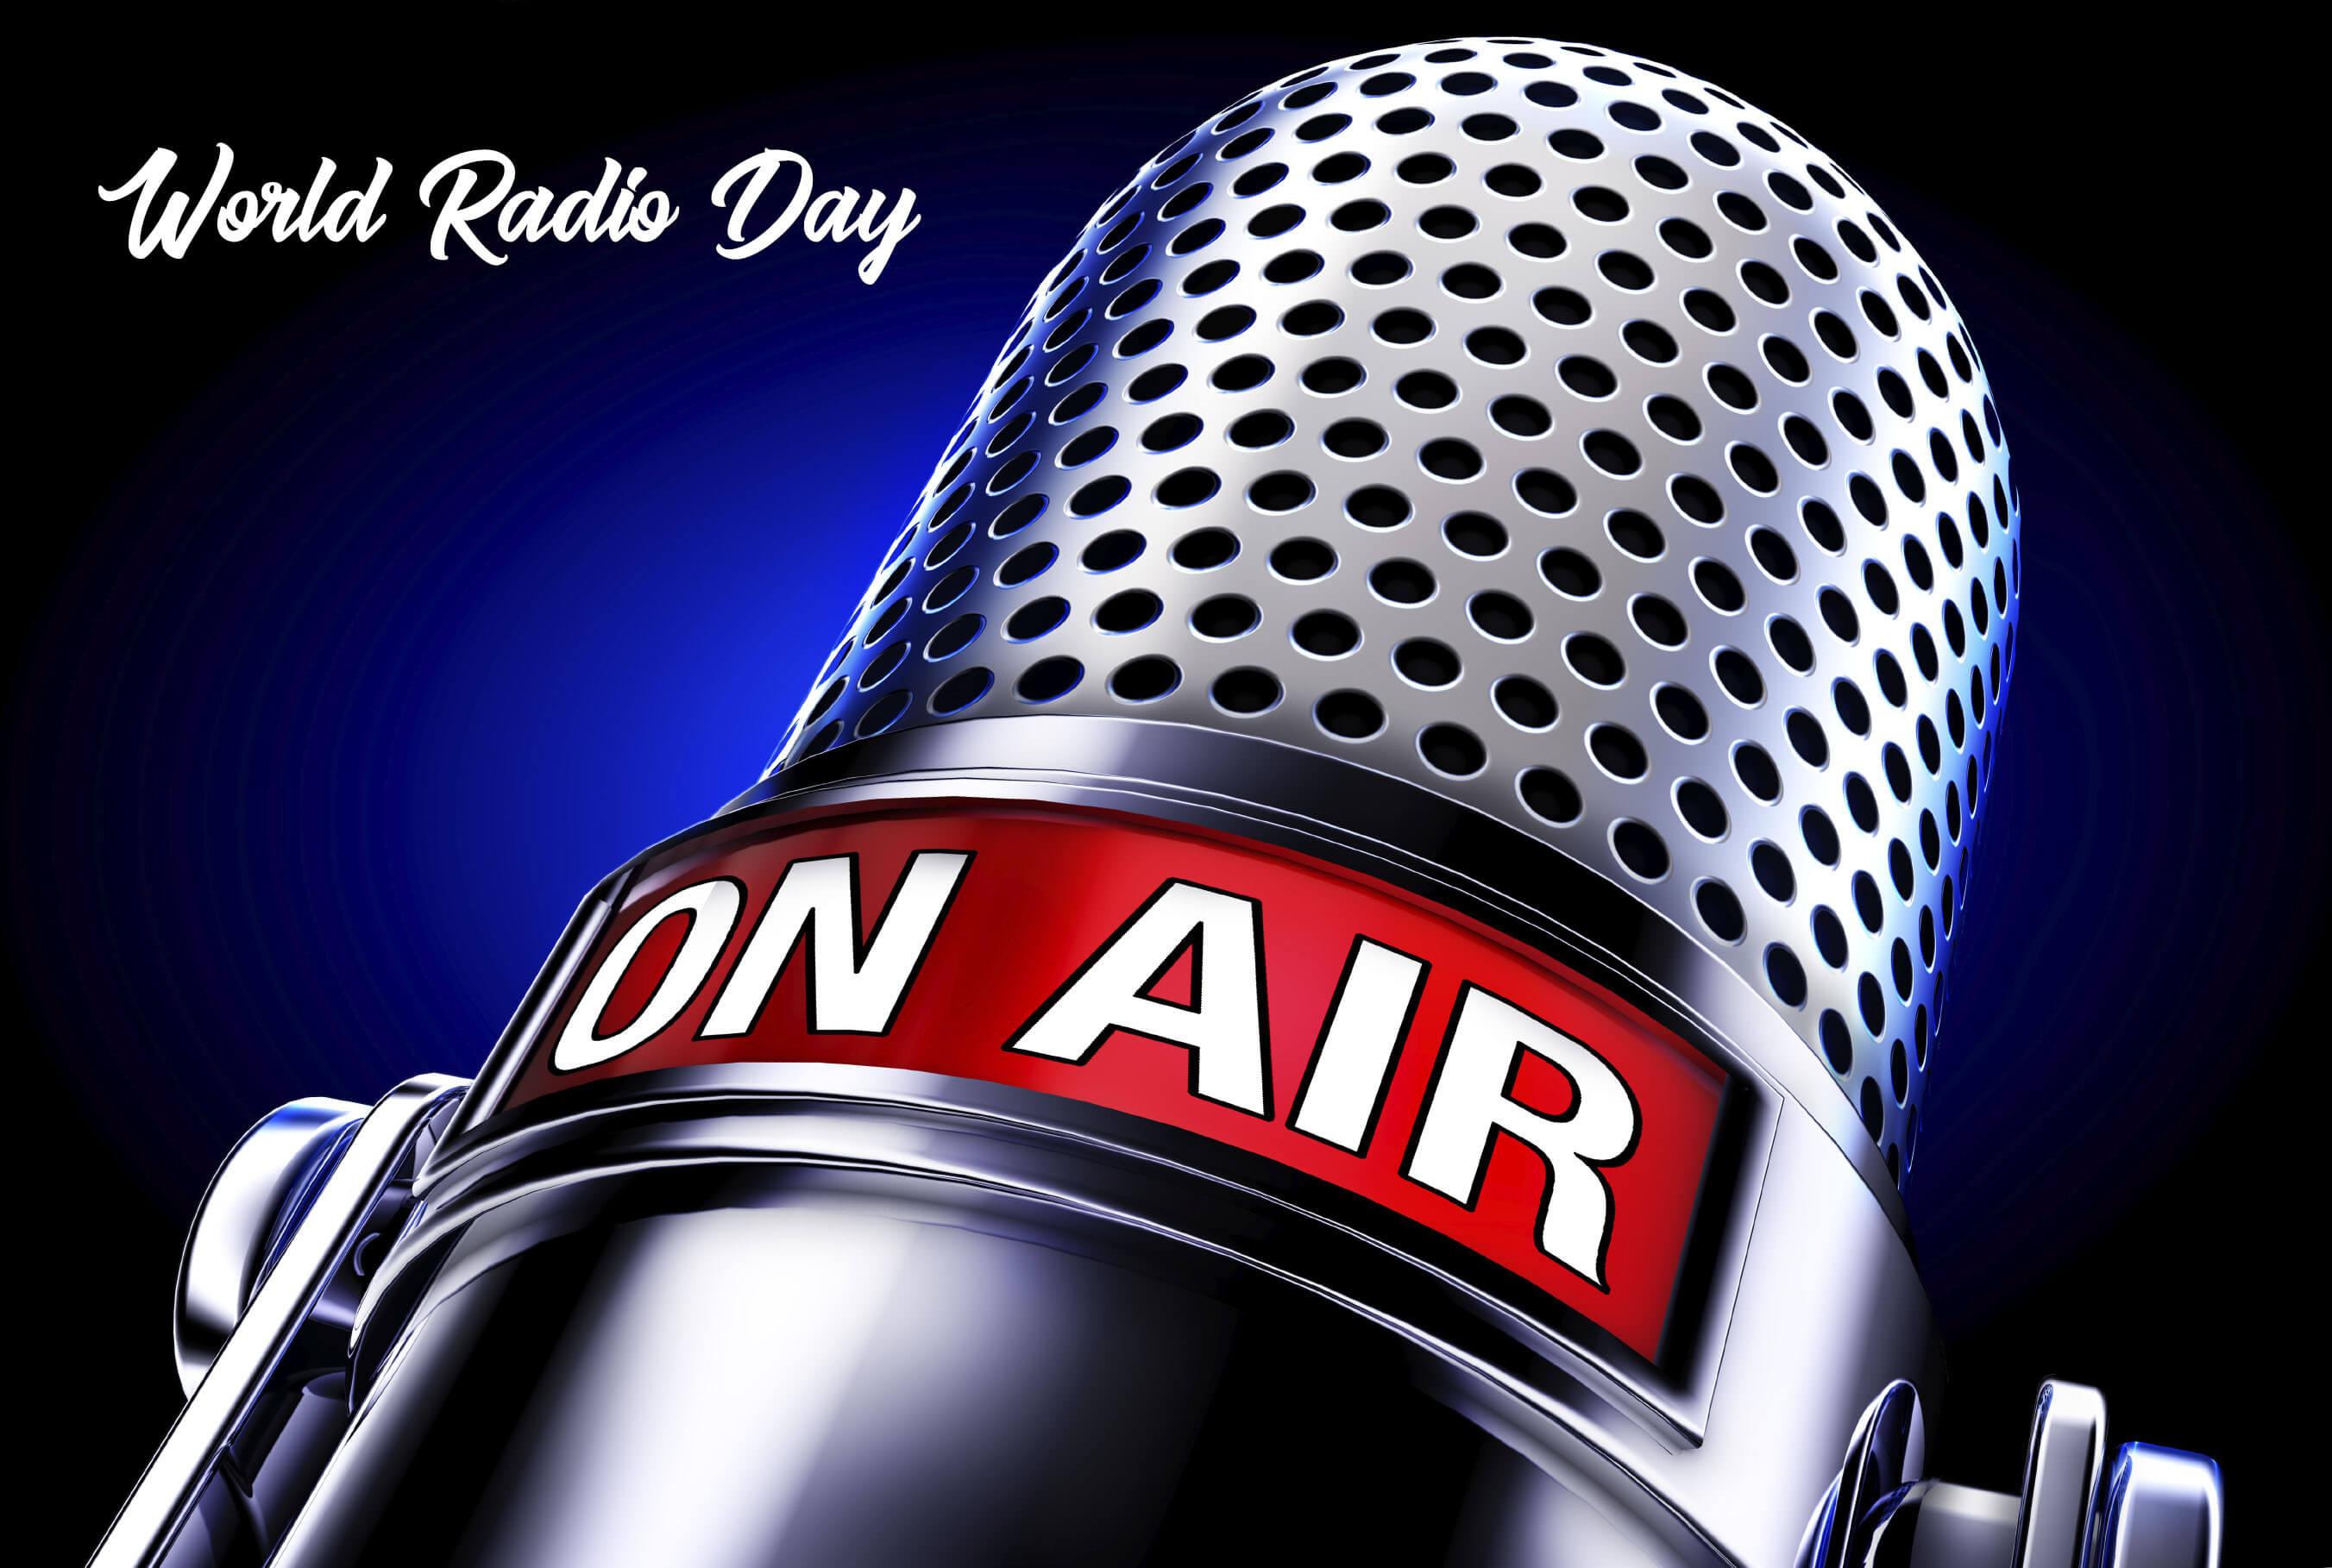 world radio day mic desktop background large hd wallpaper